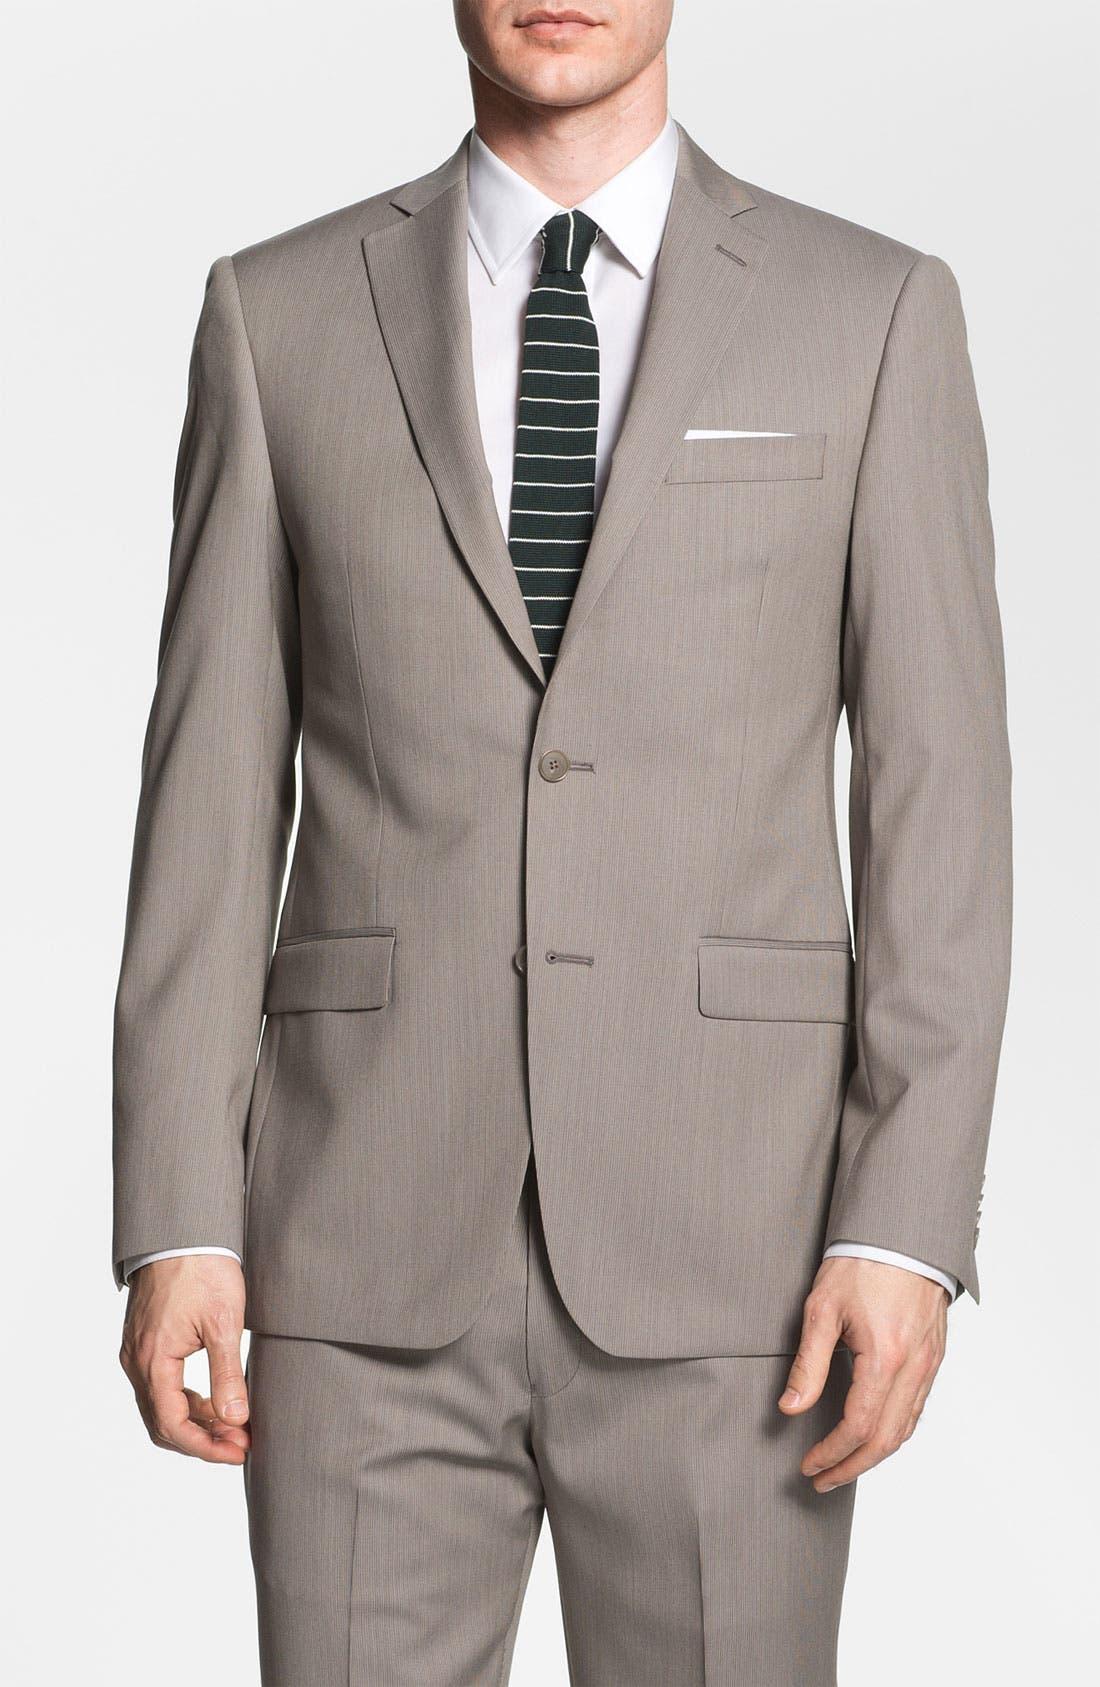 Main Image - Michael Kors Trim Fit Wool Suit